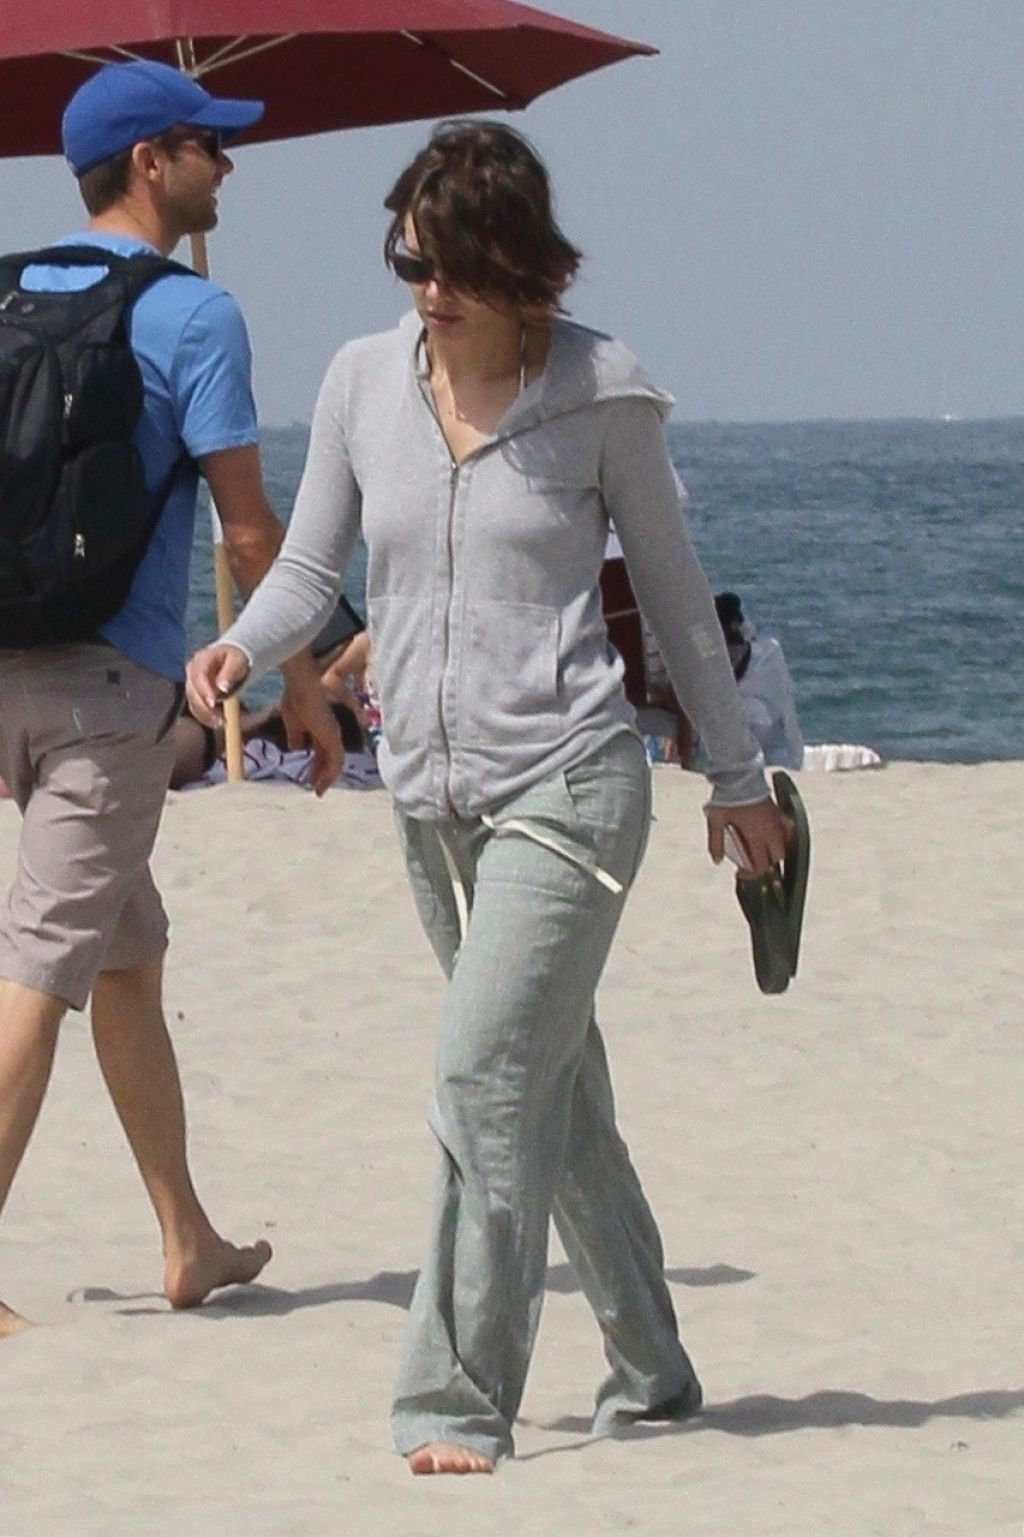 Correspondents Dinner >> Lauren Cohan and Alanna Masterson at Coronado Beach in San Diego 07/21/2017